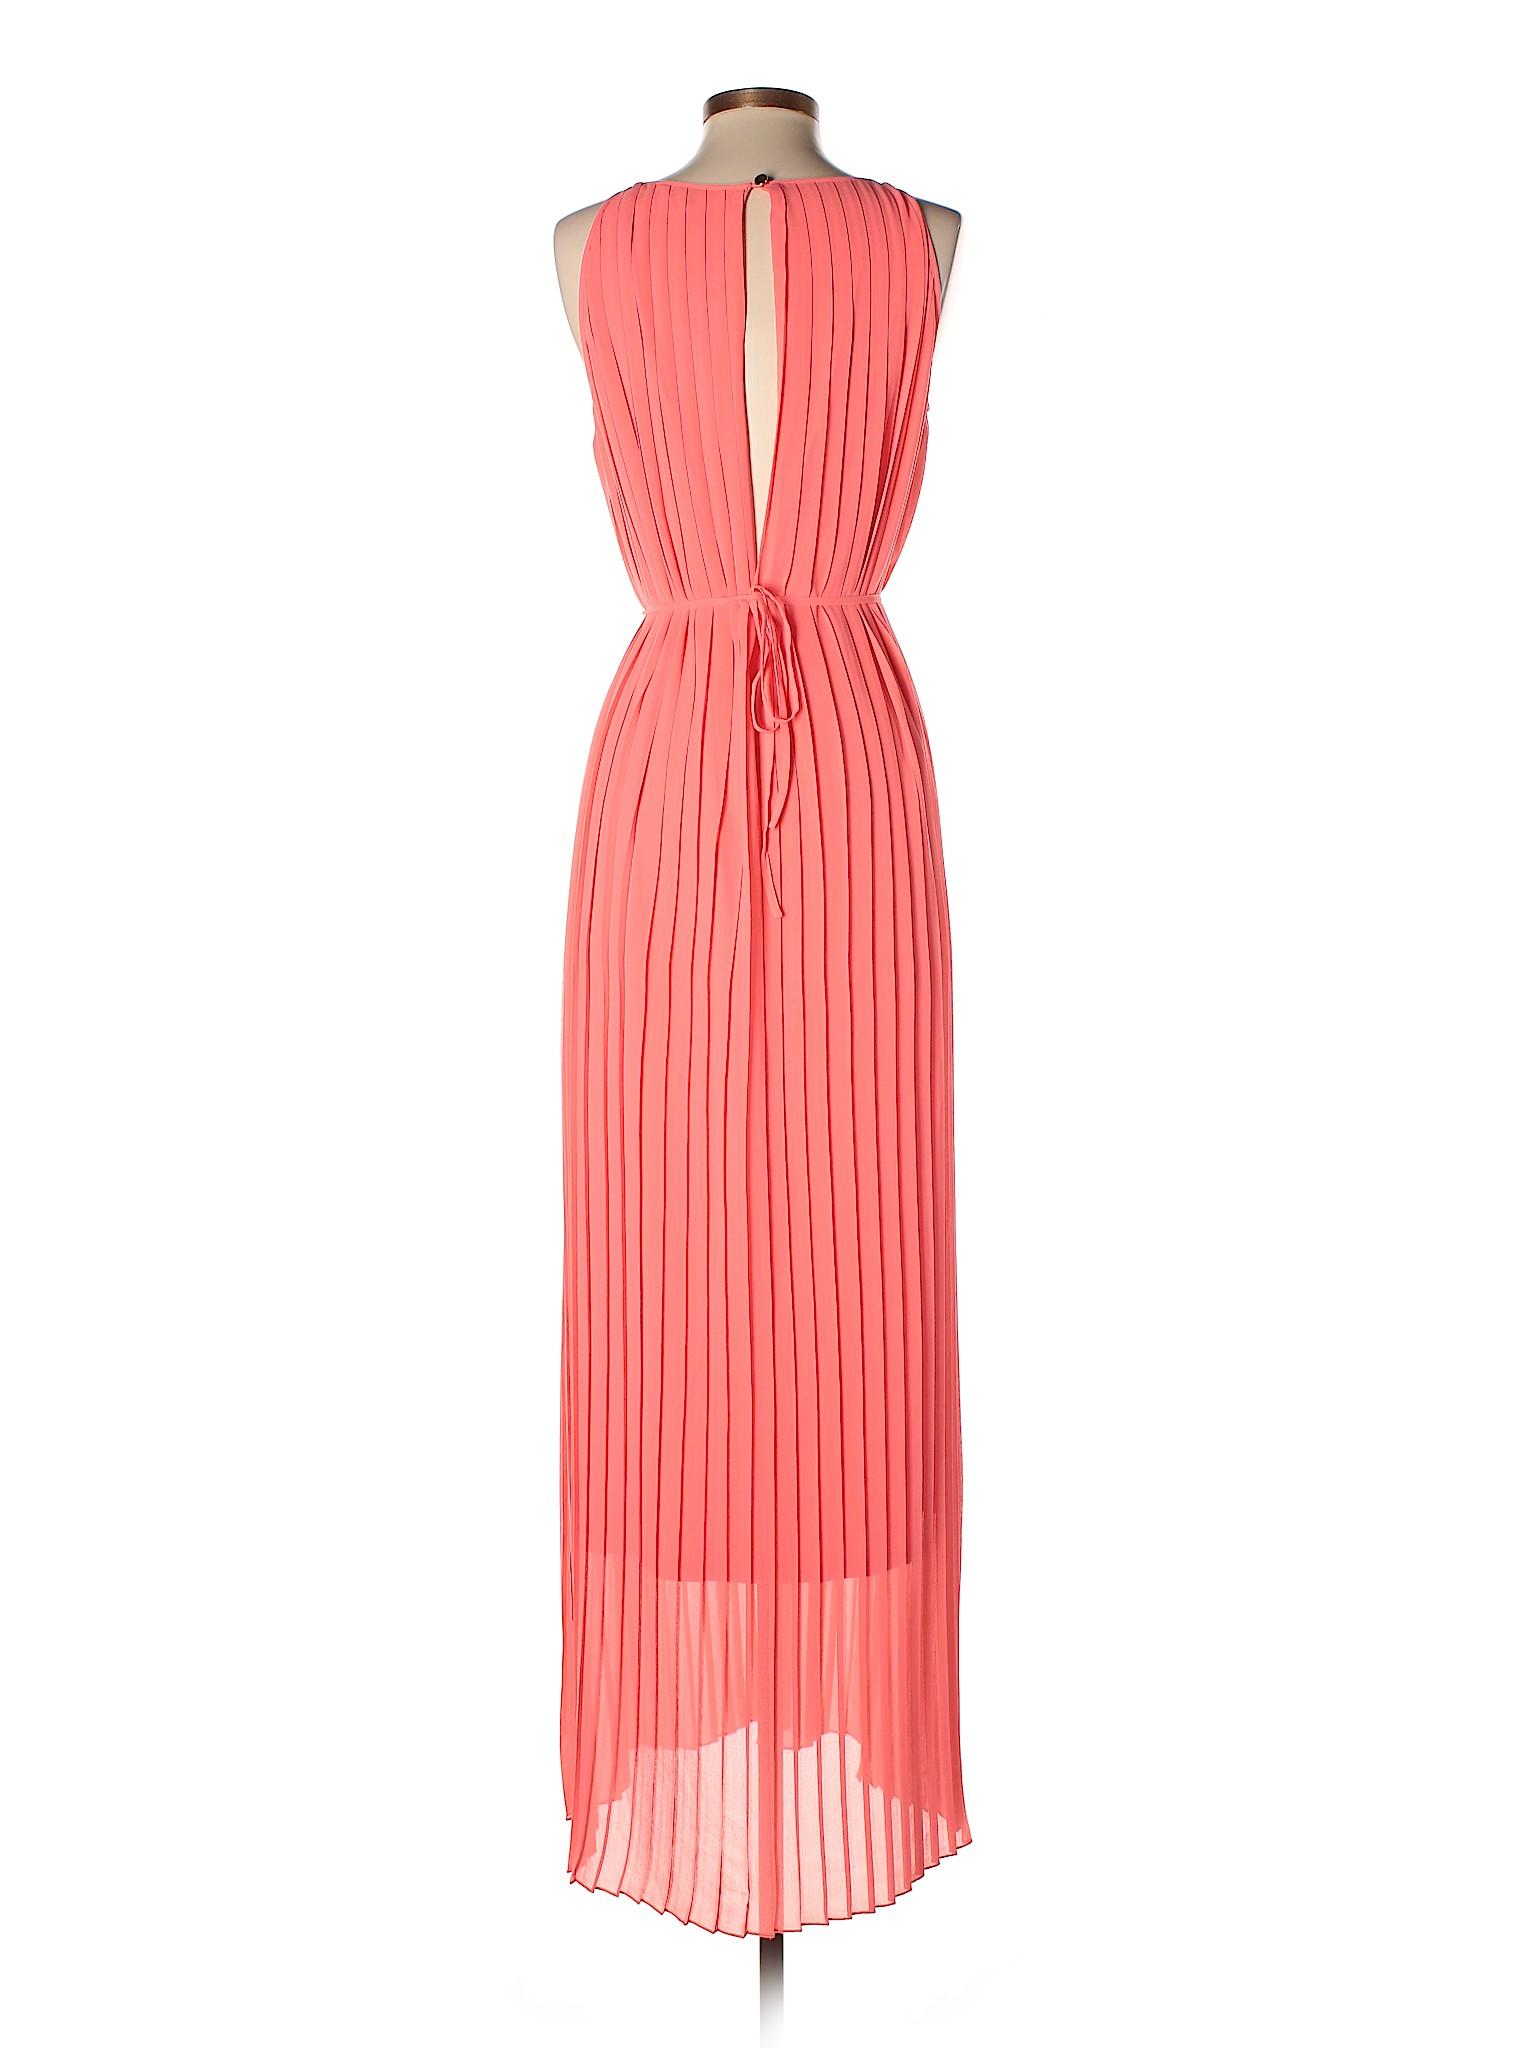 Casual winter amp; COCO Dress FELICITY Boutique fC0Sxf